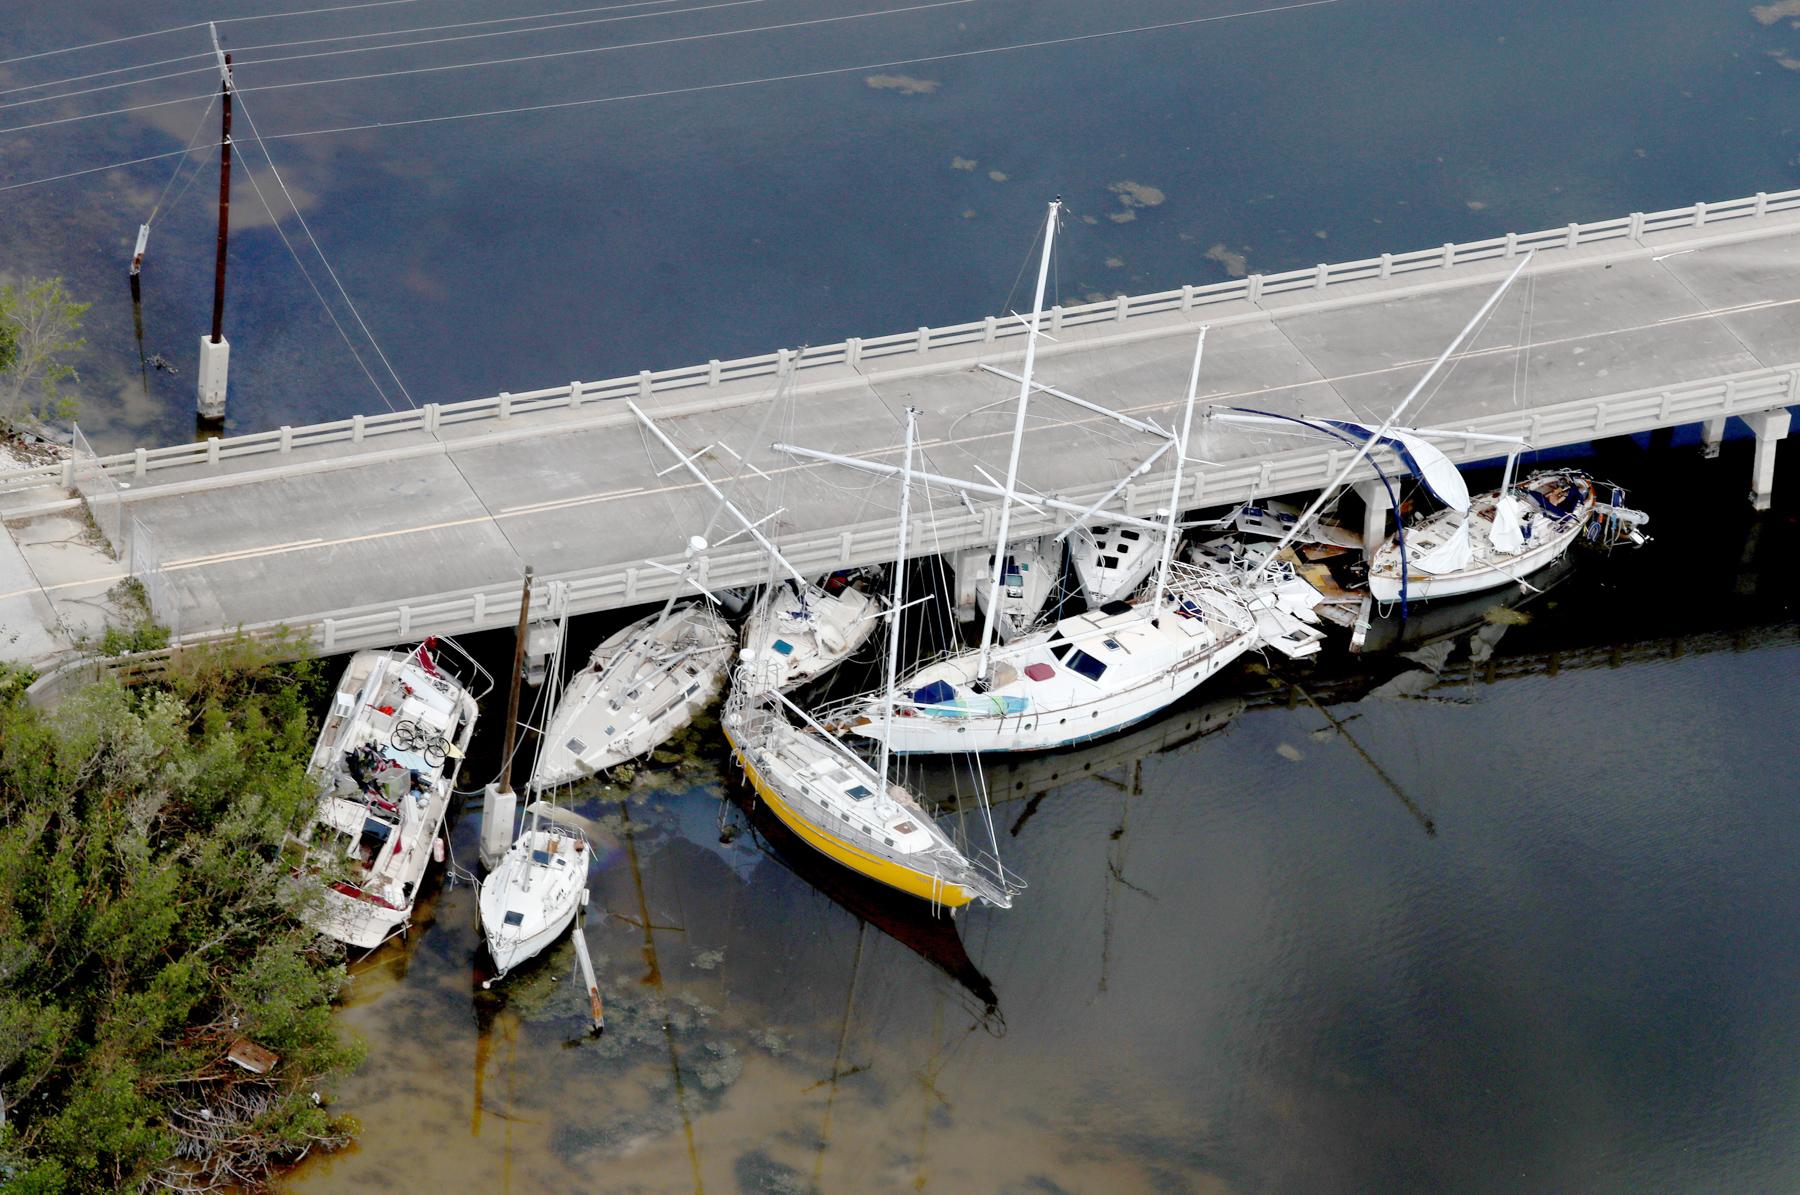 Boats wedged under bridge (© Mike Stocker/Sun-Sentinel/TNS via Getty Images)